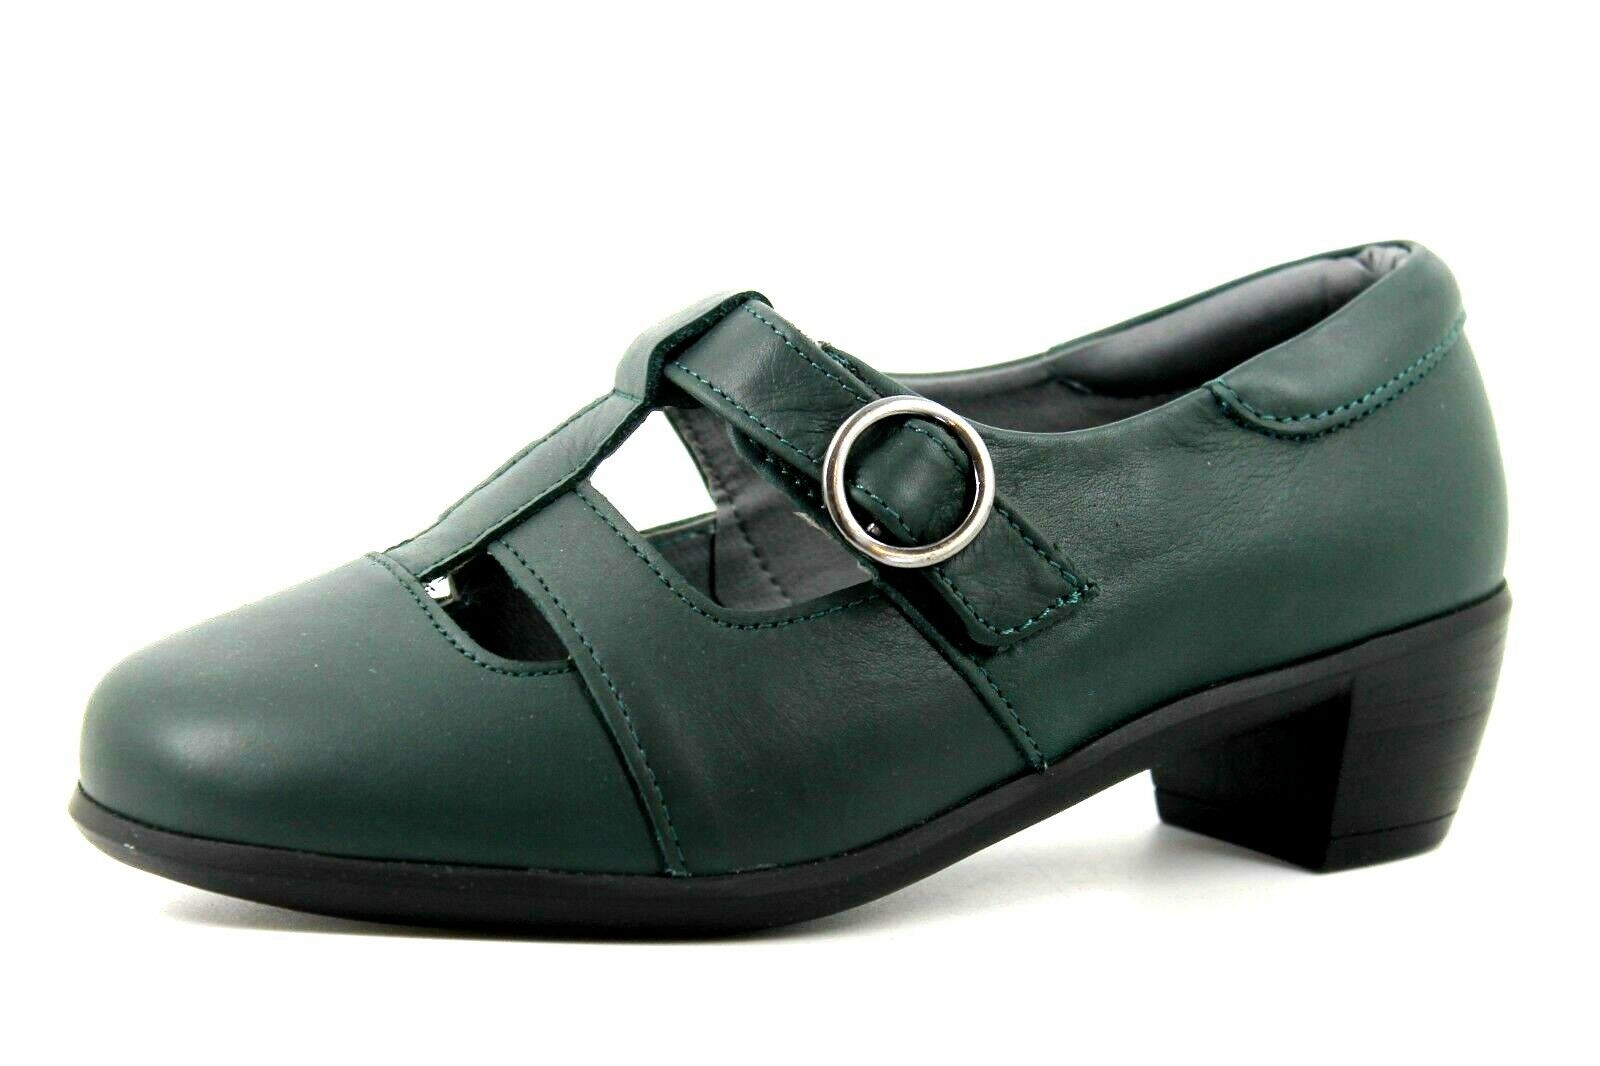 Cosyfeet Florence UK 5 EEEEE+ Extra Roomy Leather shoes for Elderly Swollen Feet